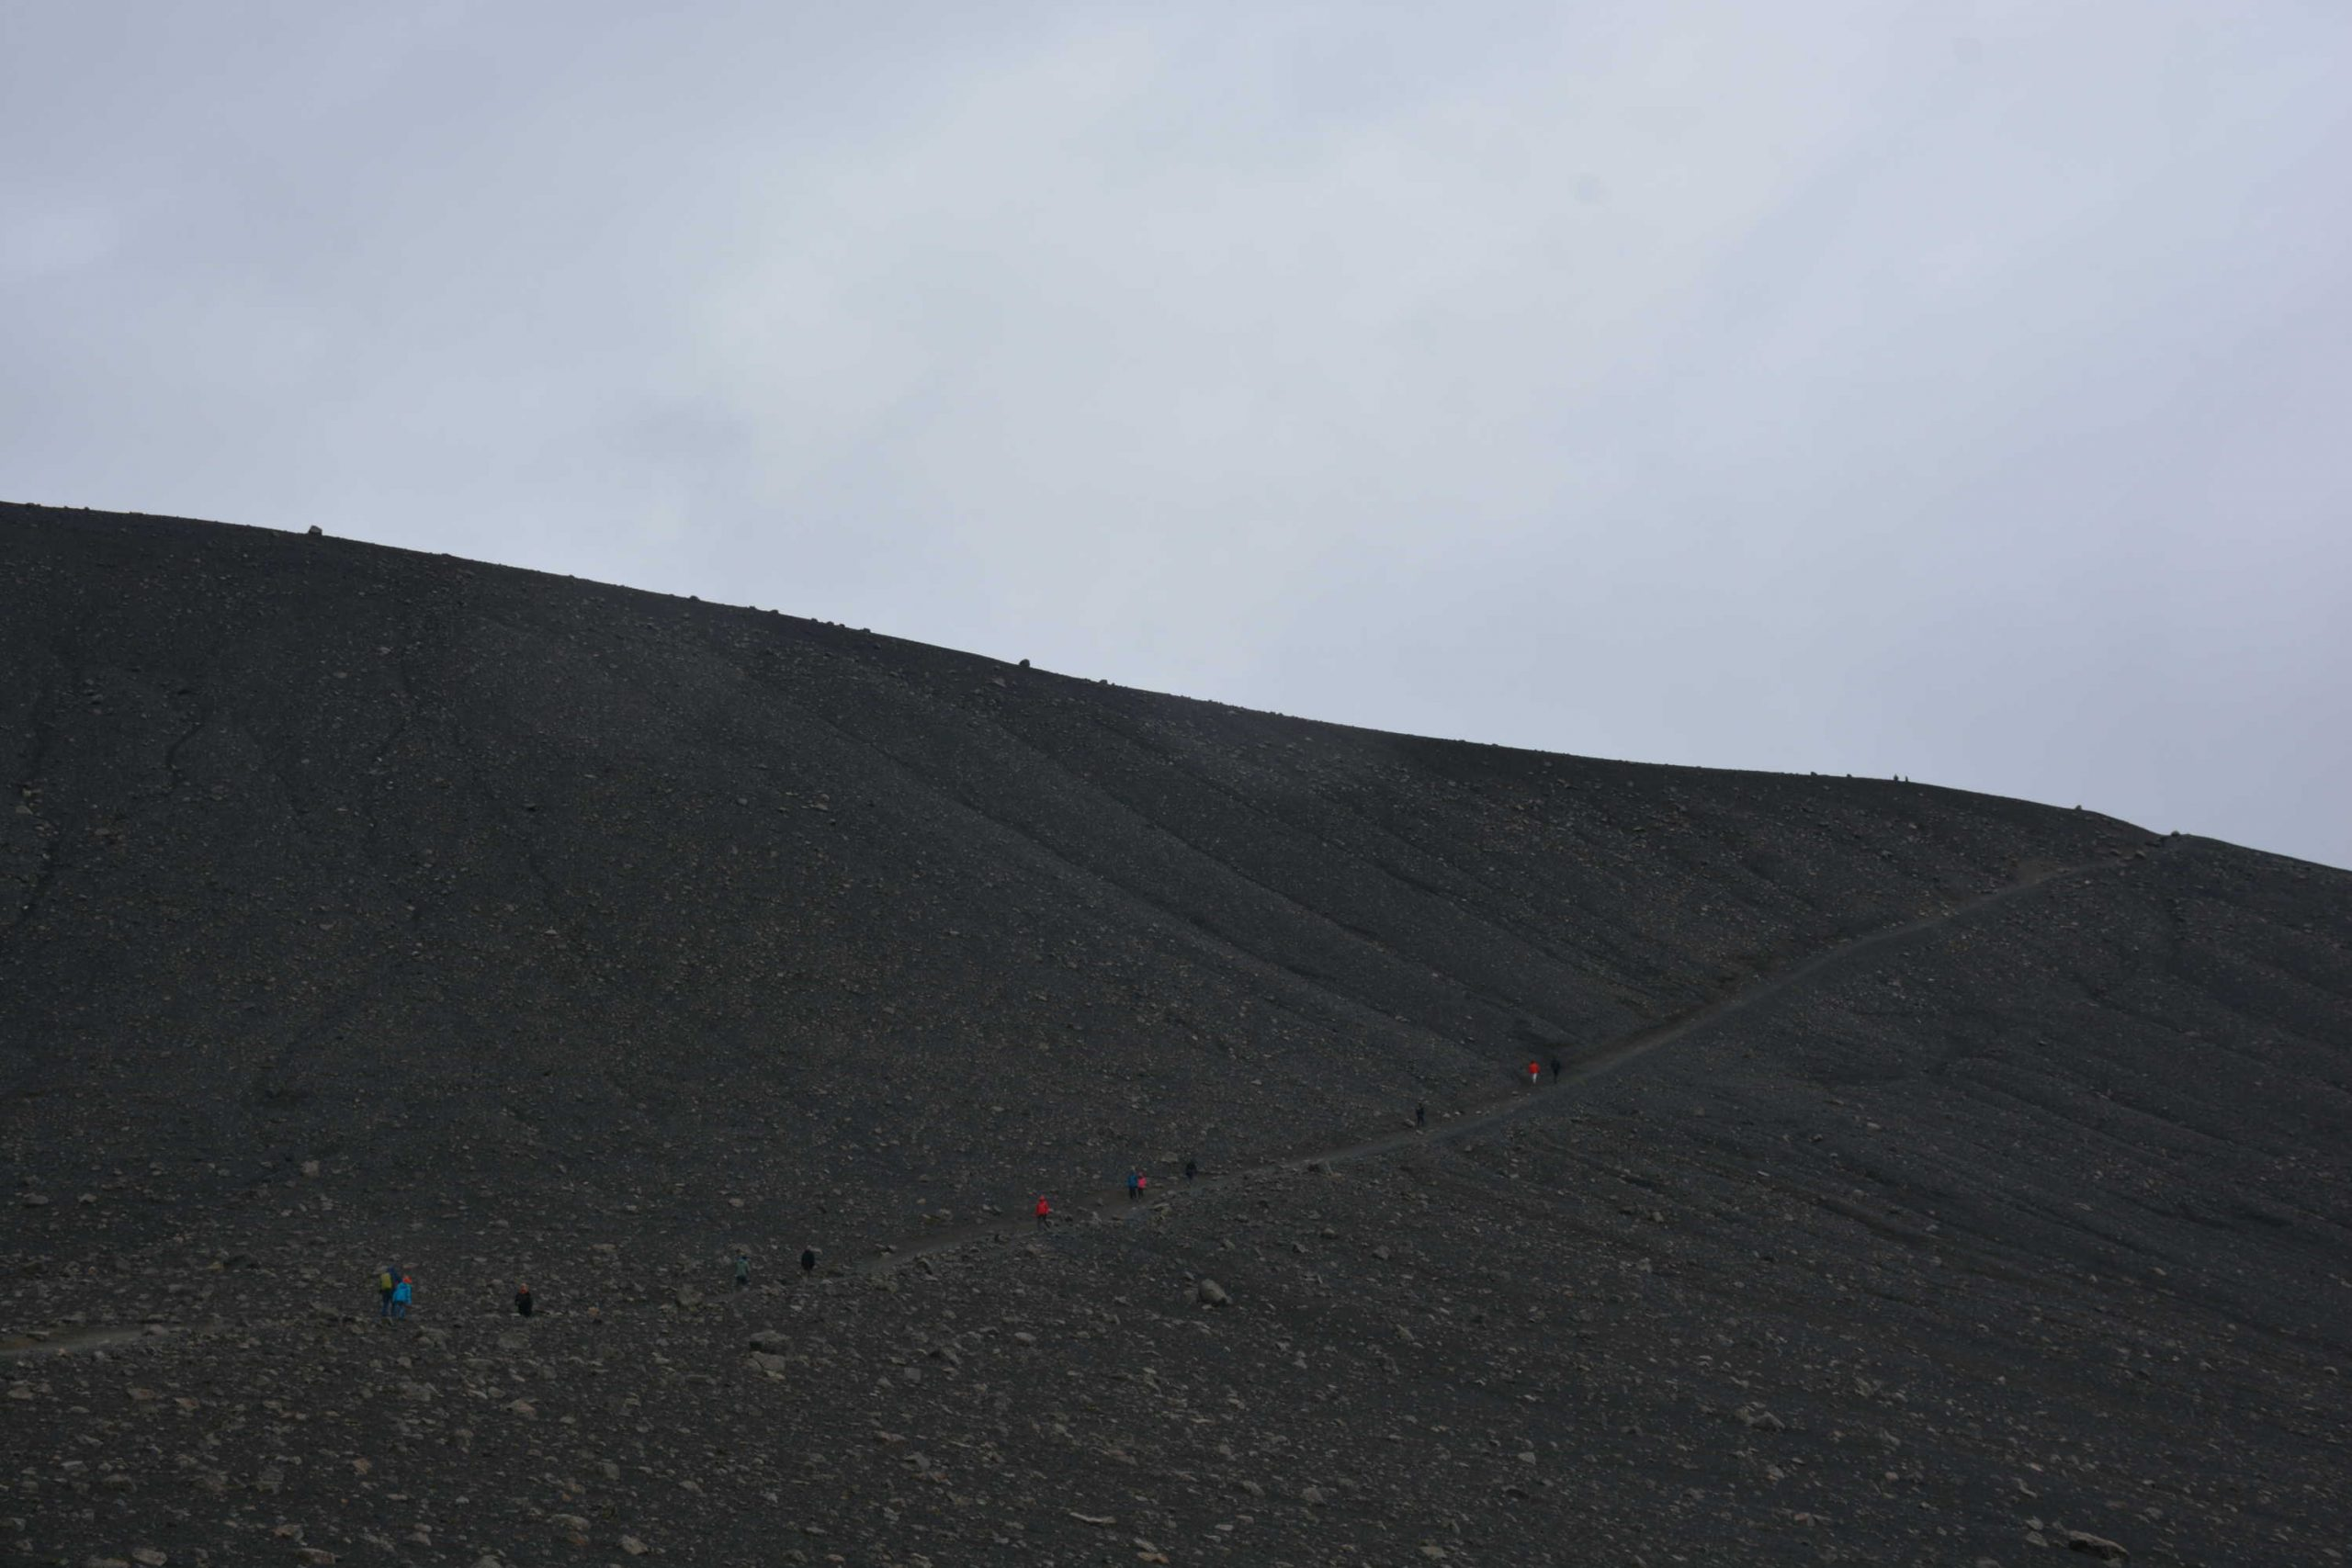 výstup na vulkán Hverfjall